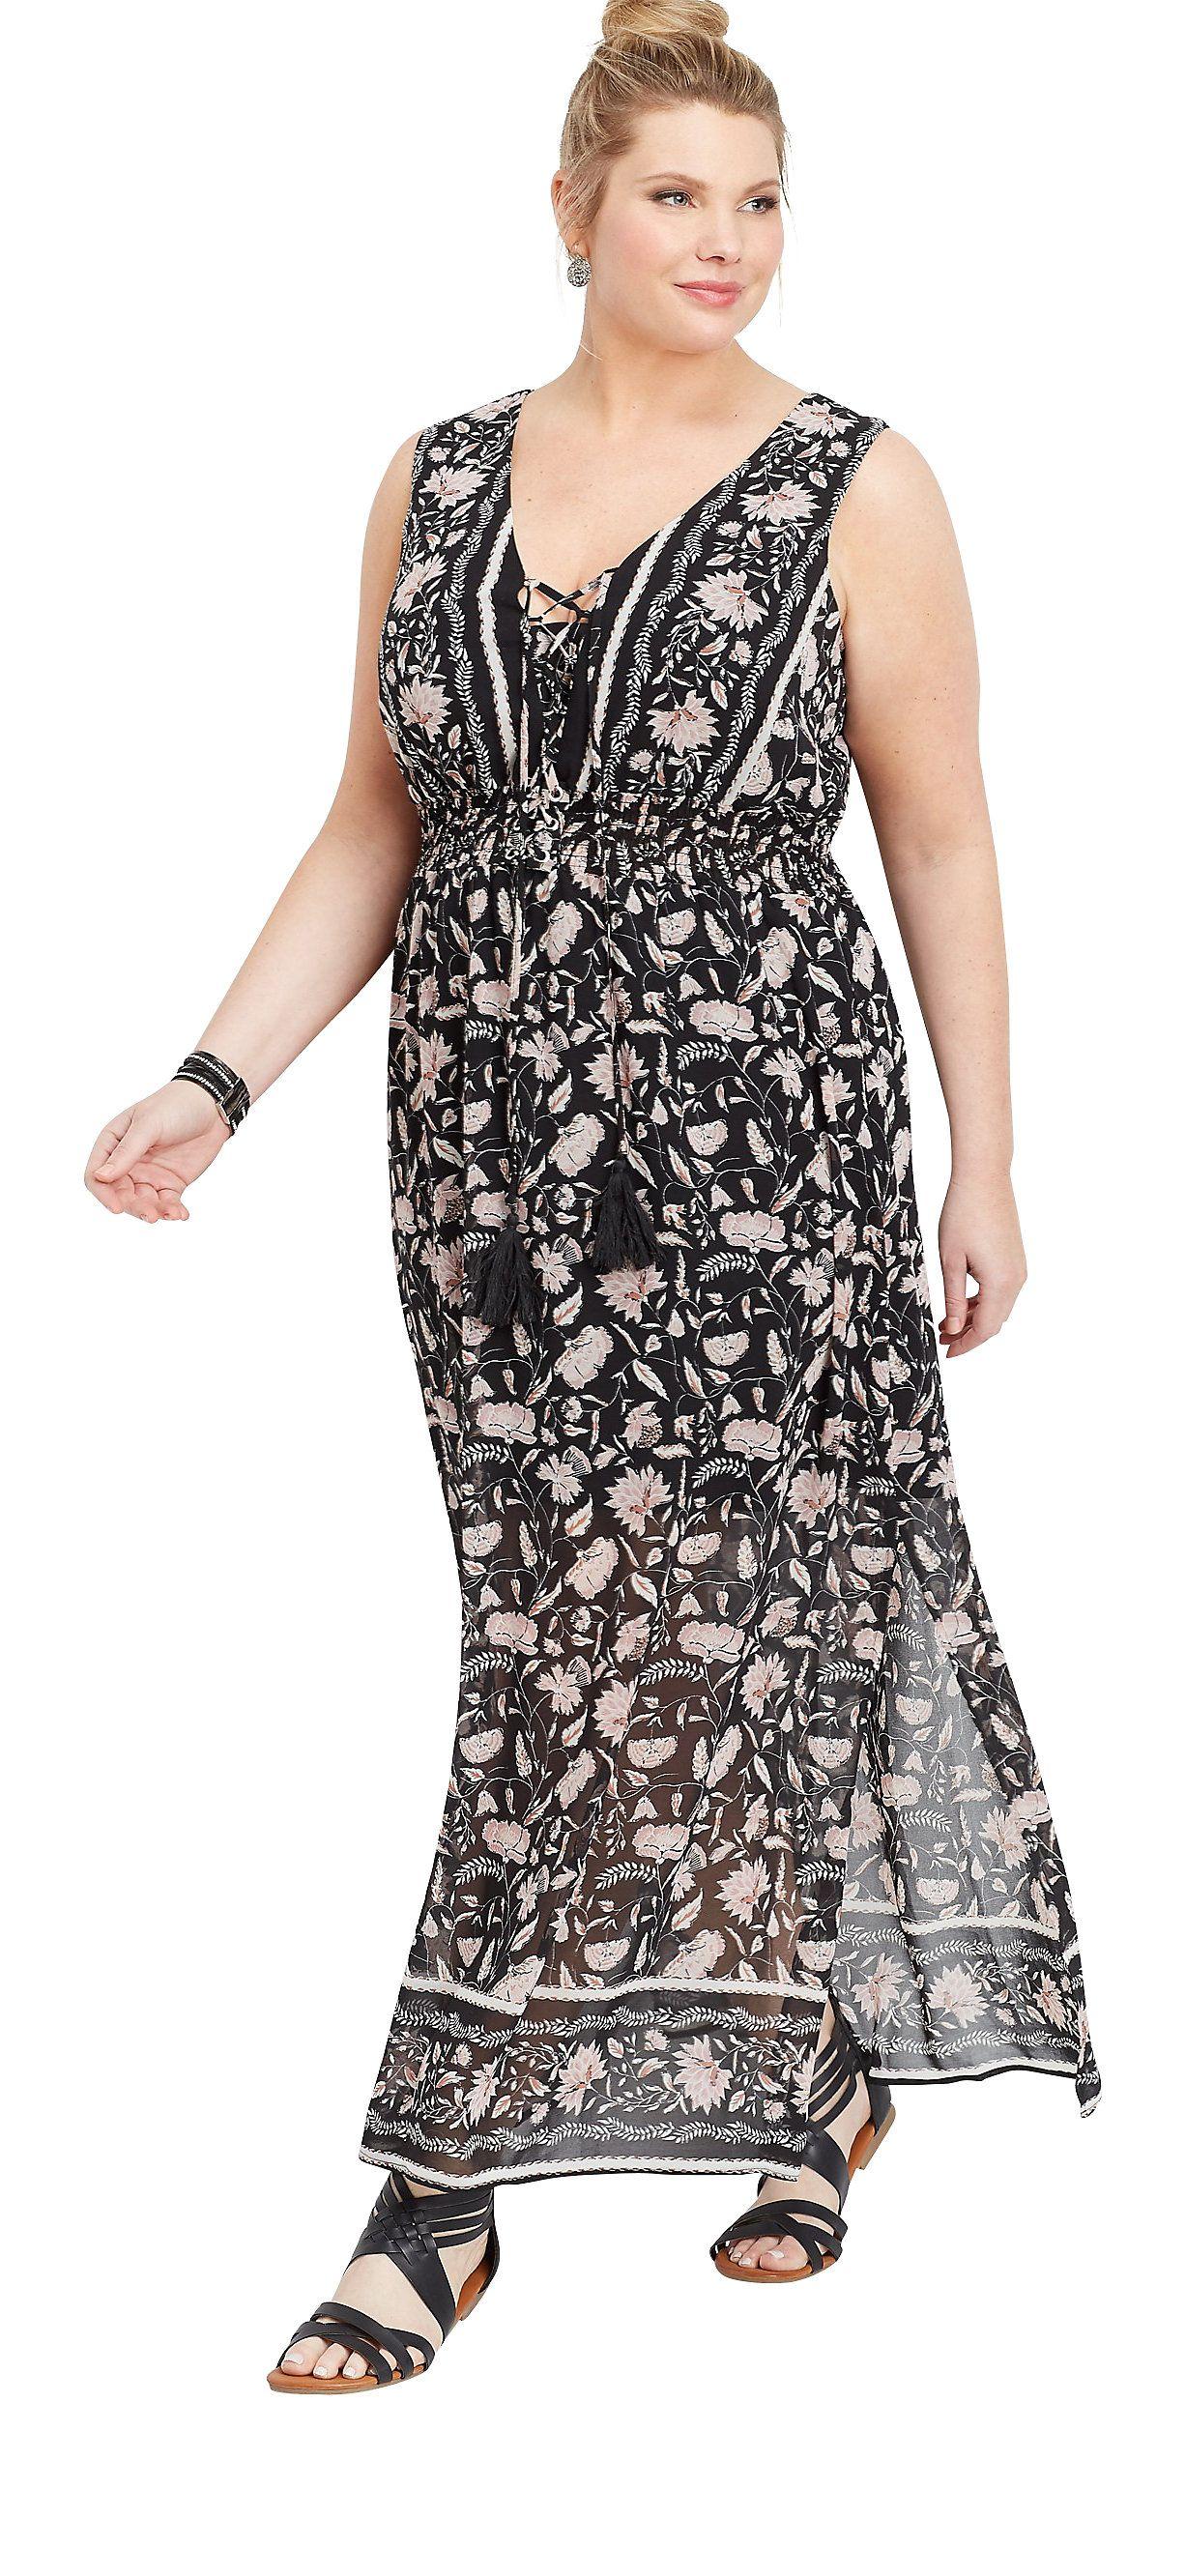 Plus Size Lace Up Border Print Maxi Dress #sponsored #plussize ...